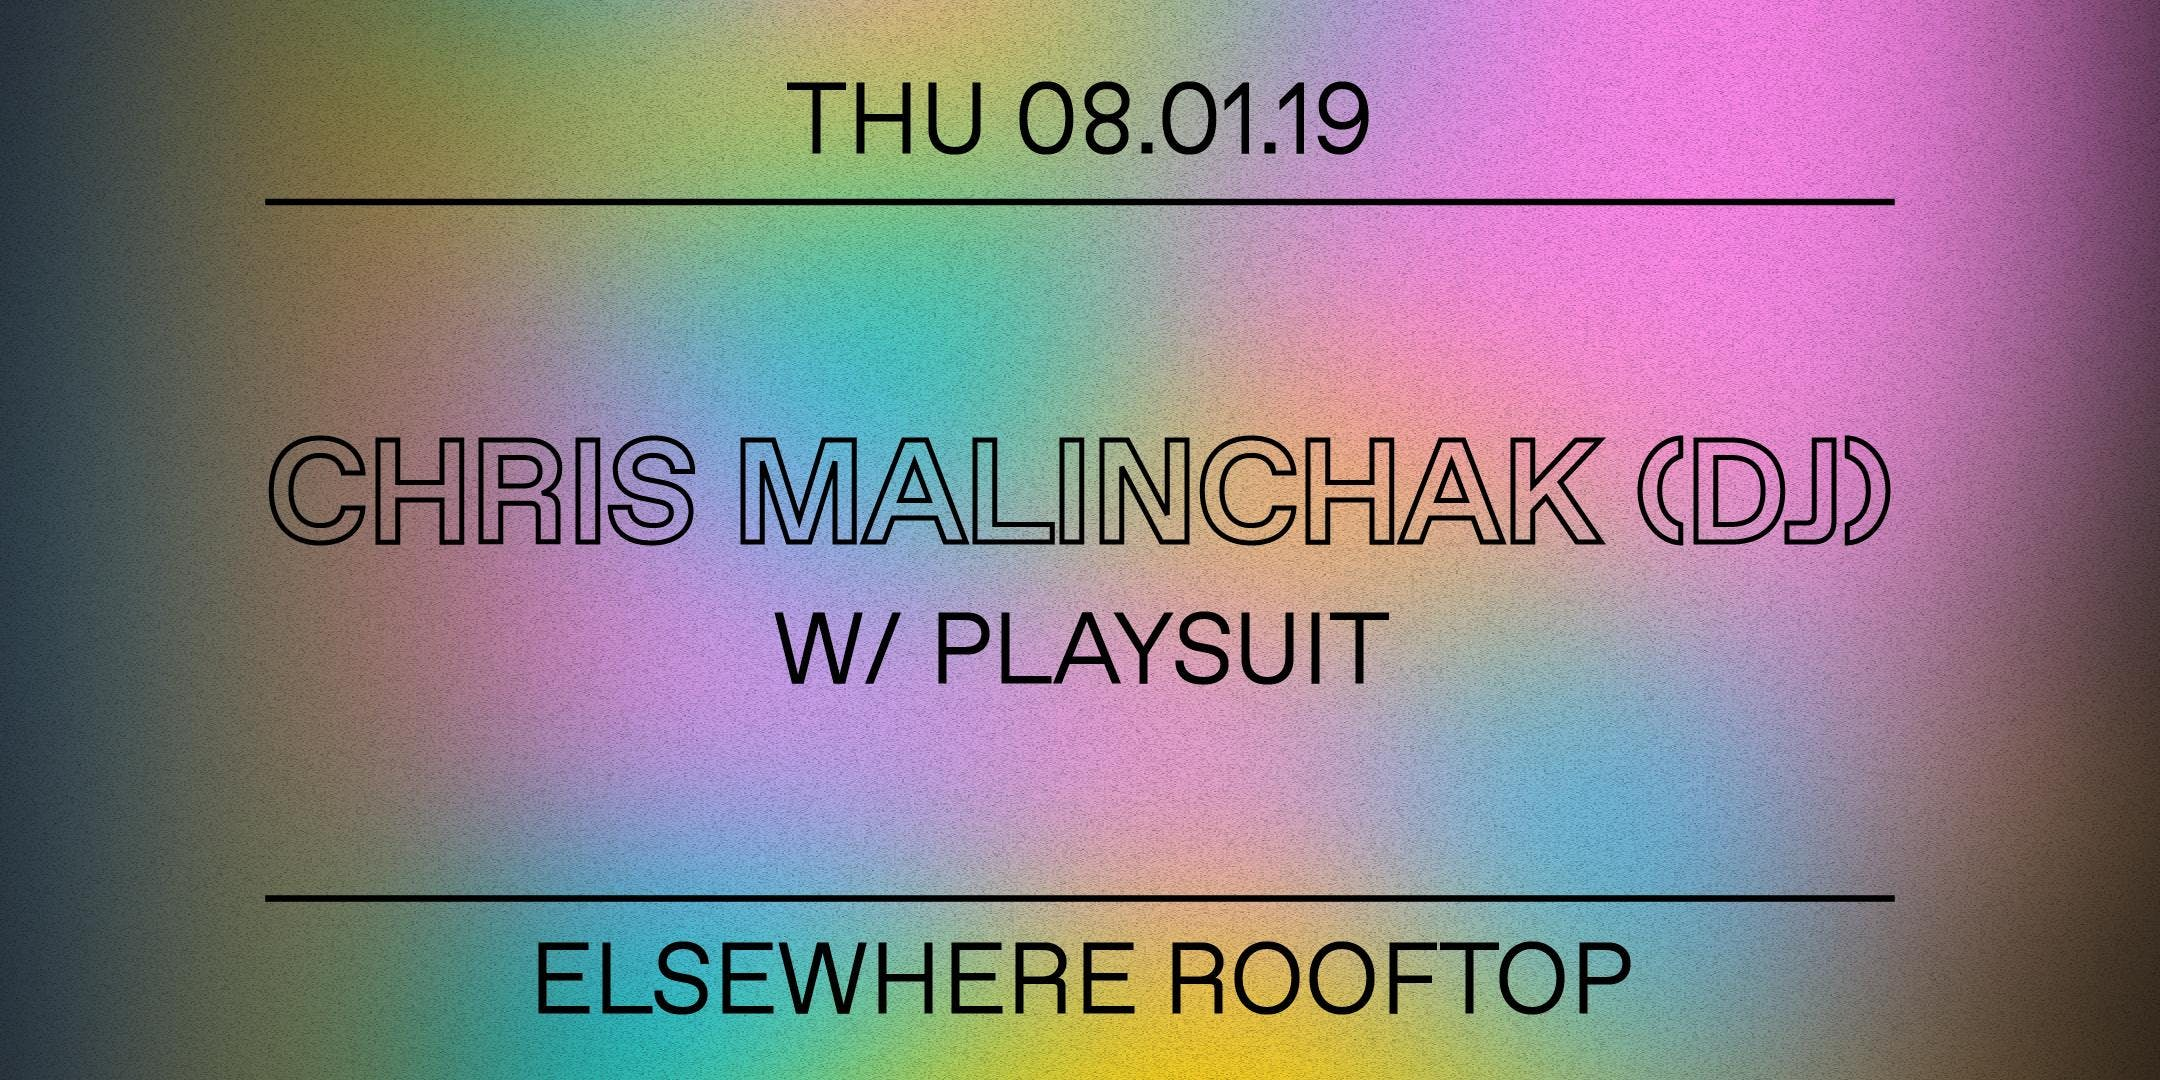 Chris Malinchak (DJ Set), Playsuit